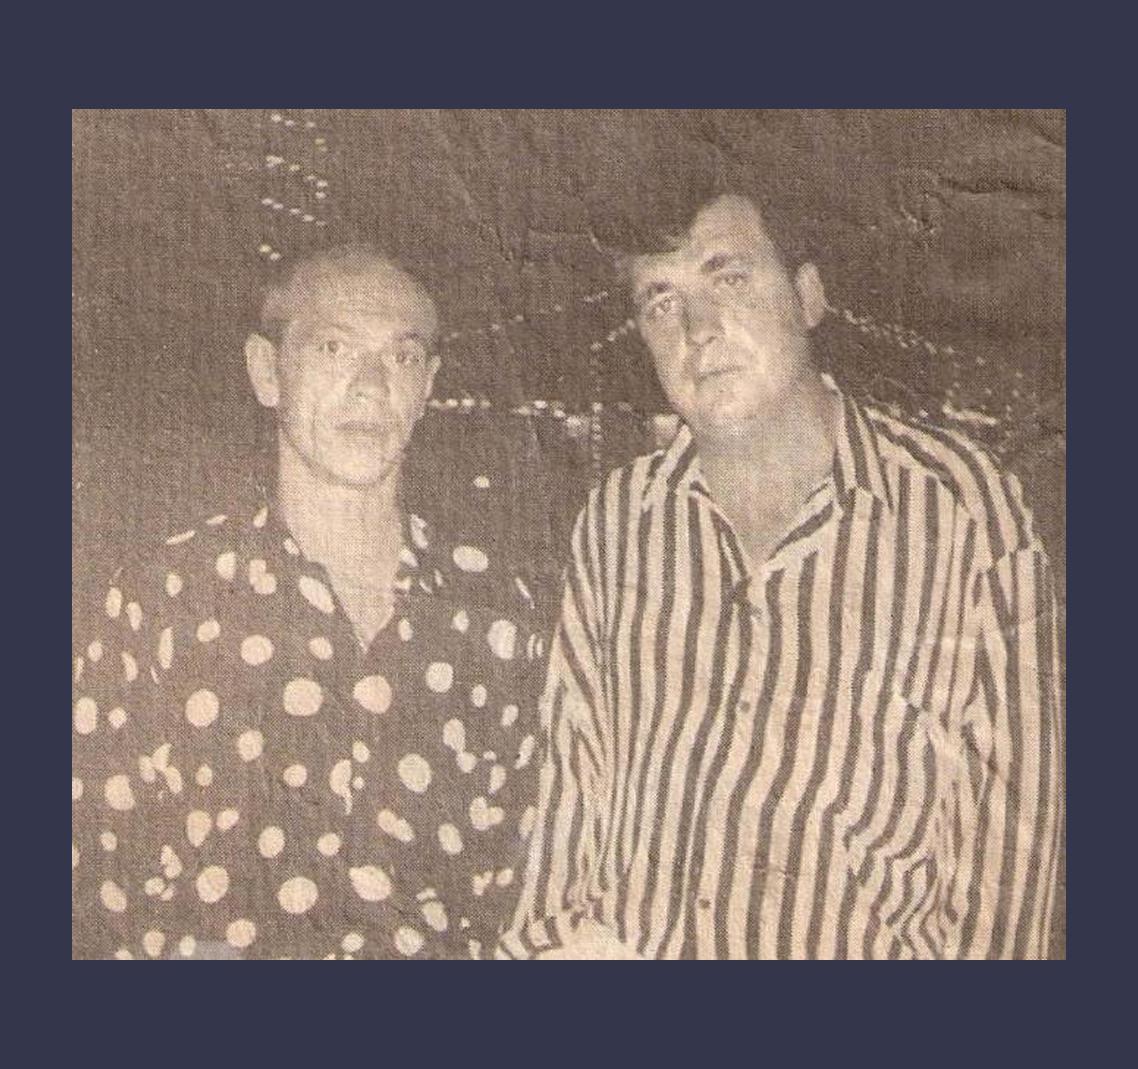 Захар Шурик с Васей Бандитом в Голландии, 1994 год. Фото ©Primecrime.ru